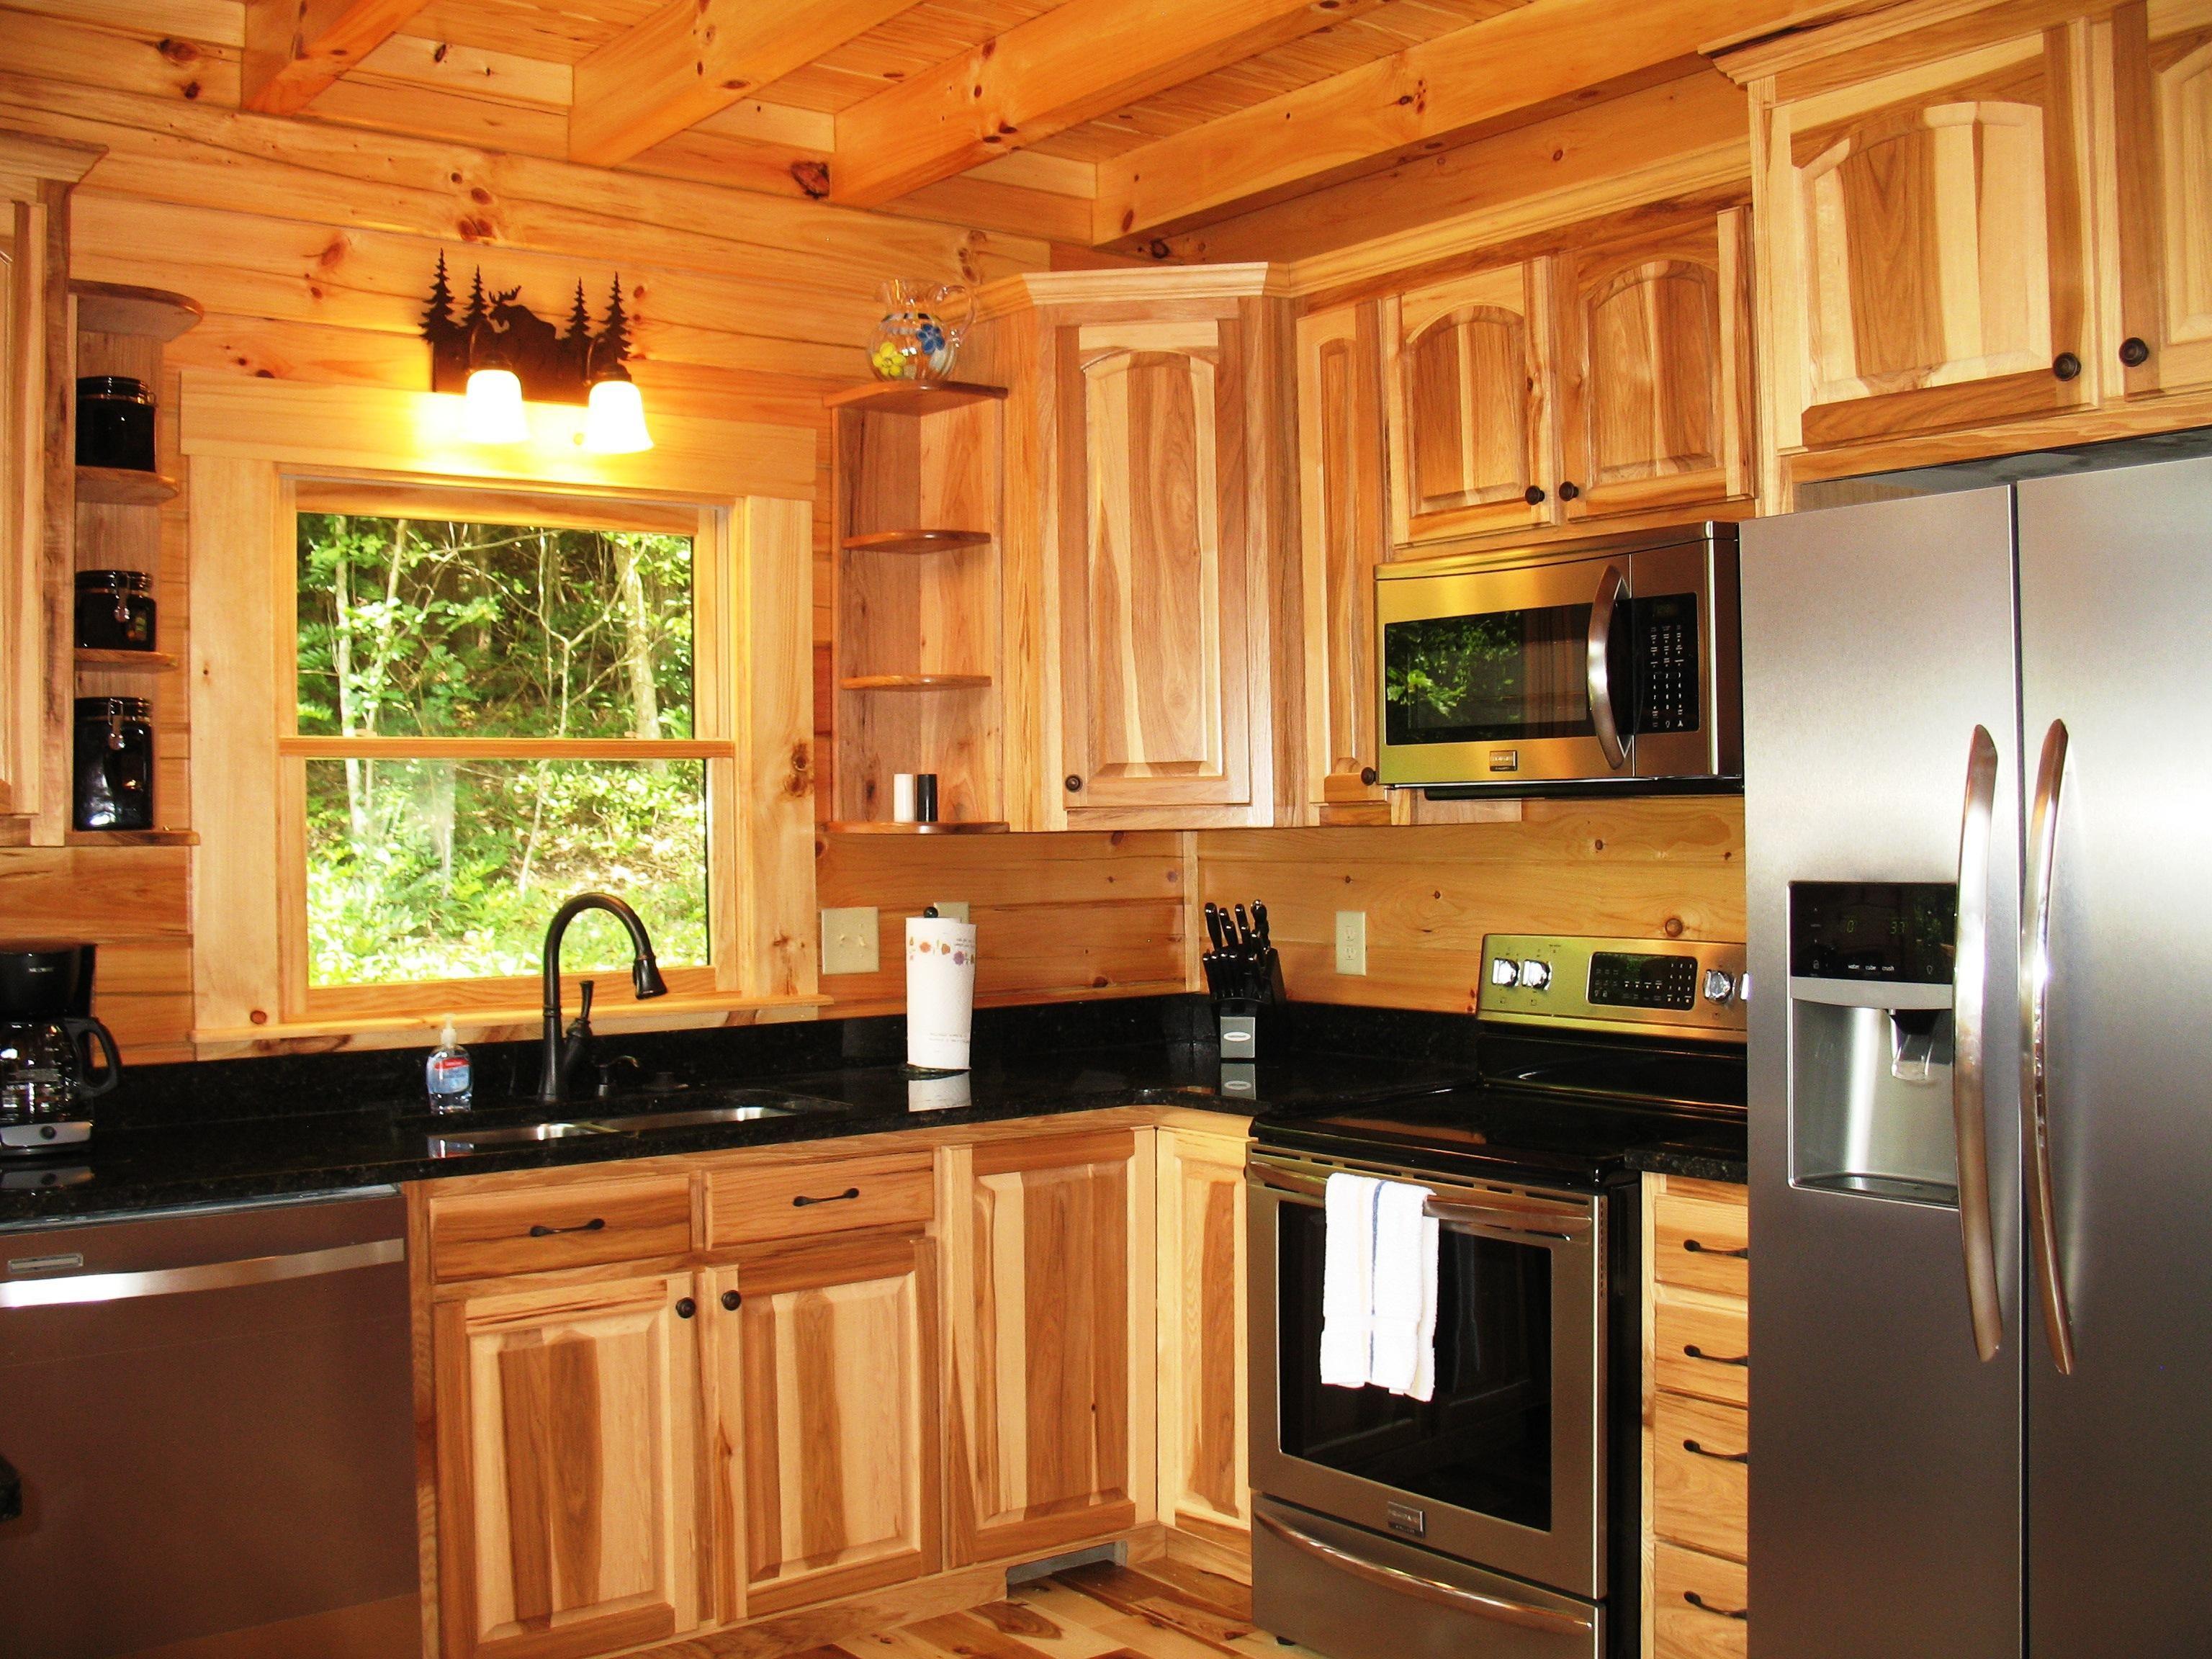 diamond kitchen cabinets reviews   cabinet, desain dapur, dapur